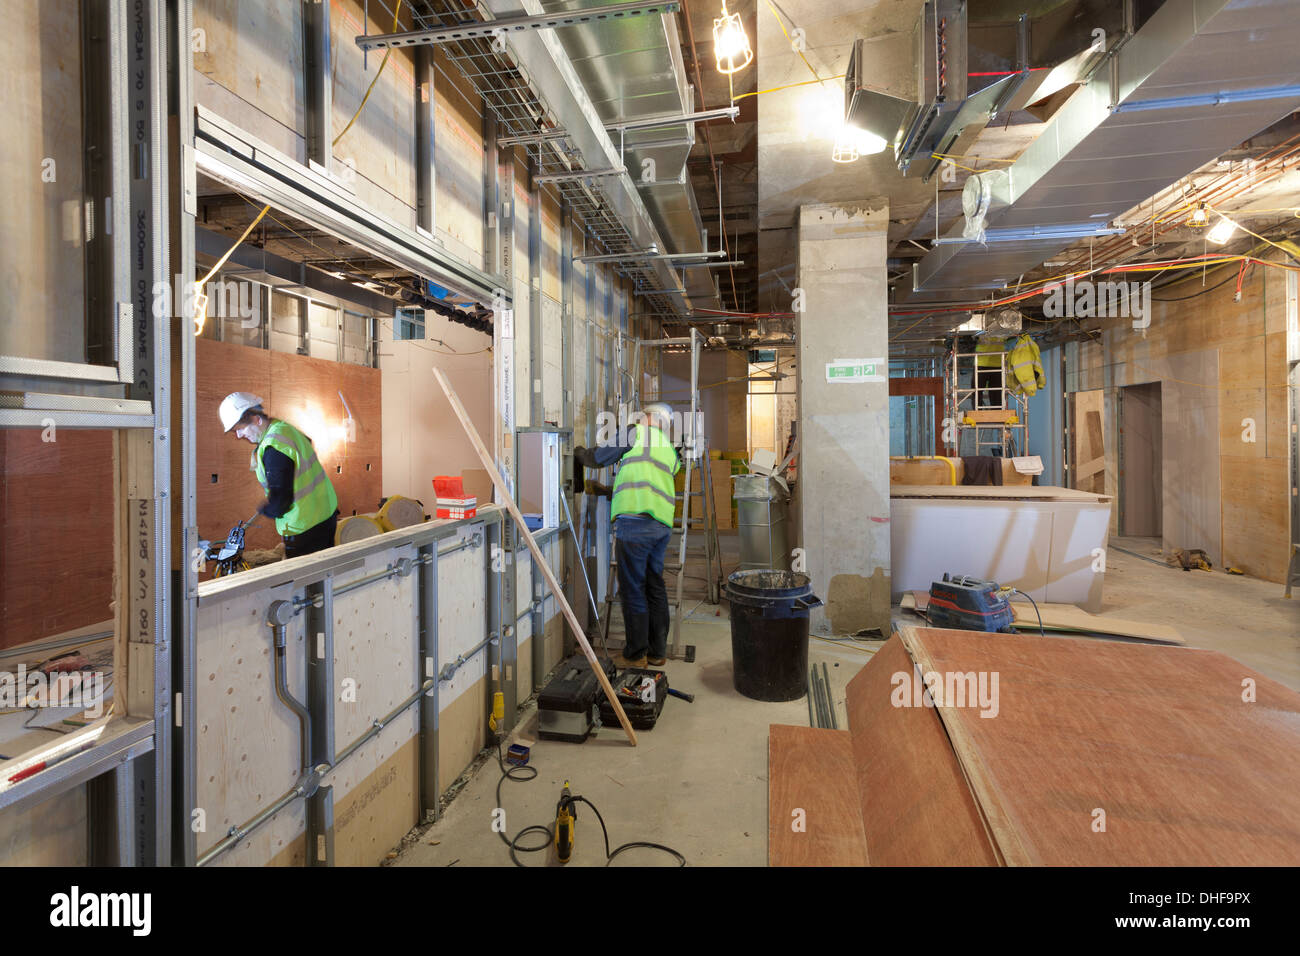 Bauherren in einer Baustelle arbeiten. Stockbild